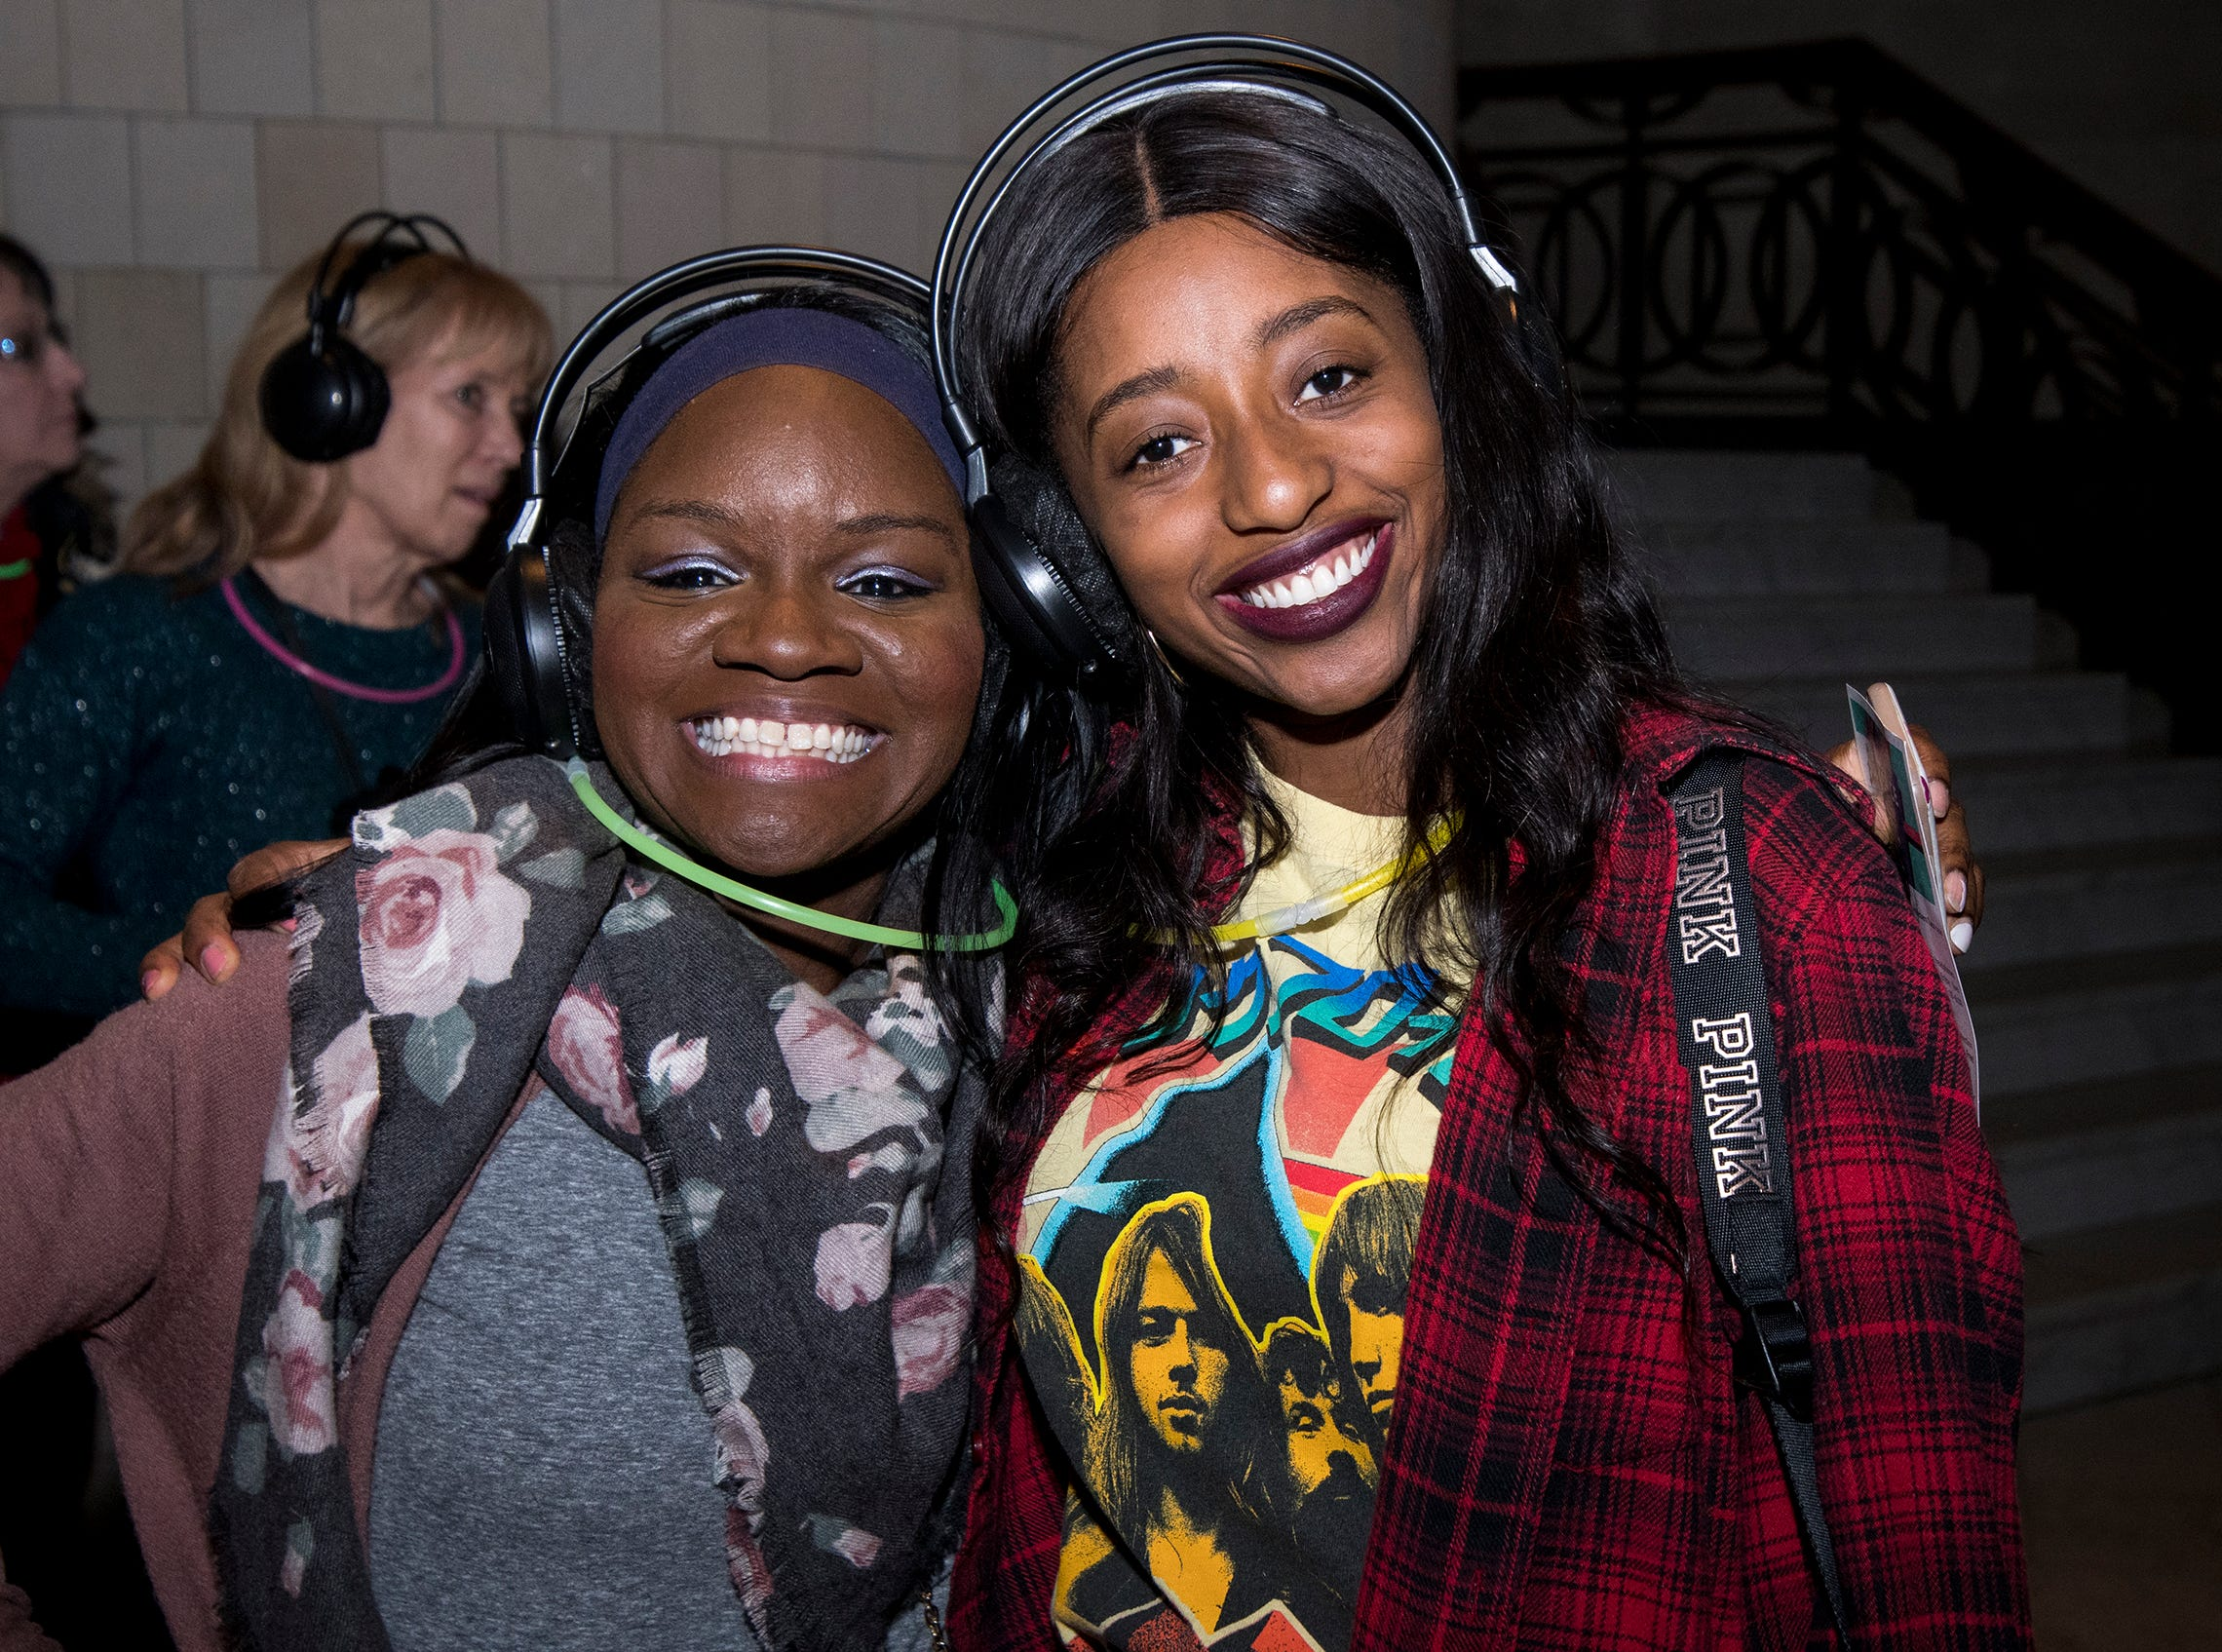 Mamawa Konuwa and Patrice Friemoth attend a 90s-themed silent disco during Art After Dark at the Cincinnati Art Museum Friday, January 25, 2019 in Cincinnati, Ohio.